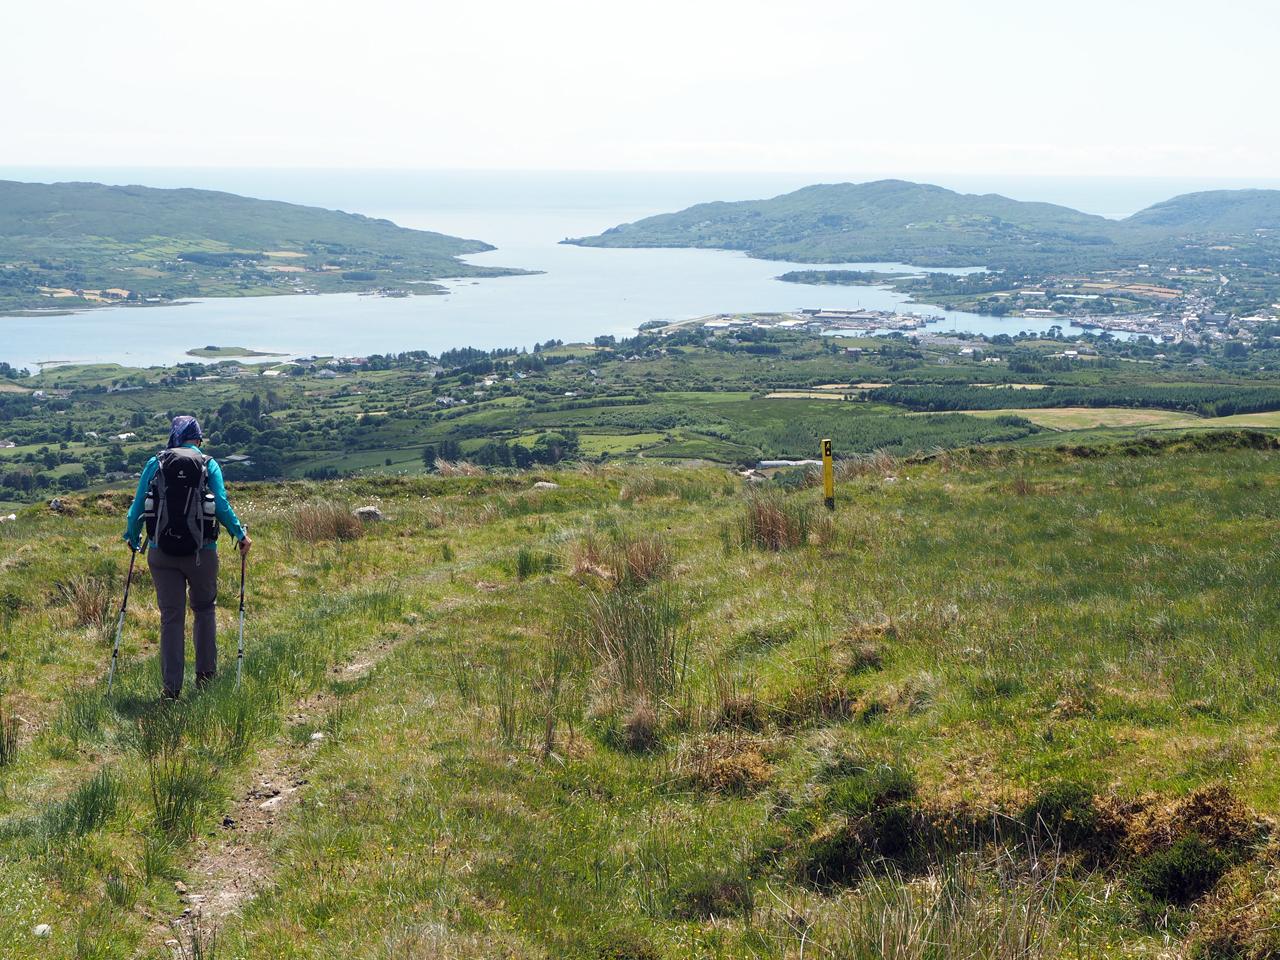 Castletownbere komt in zicht